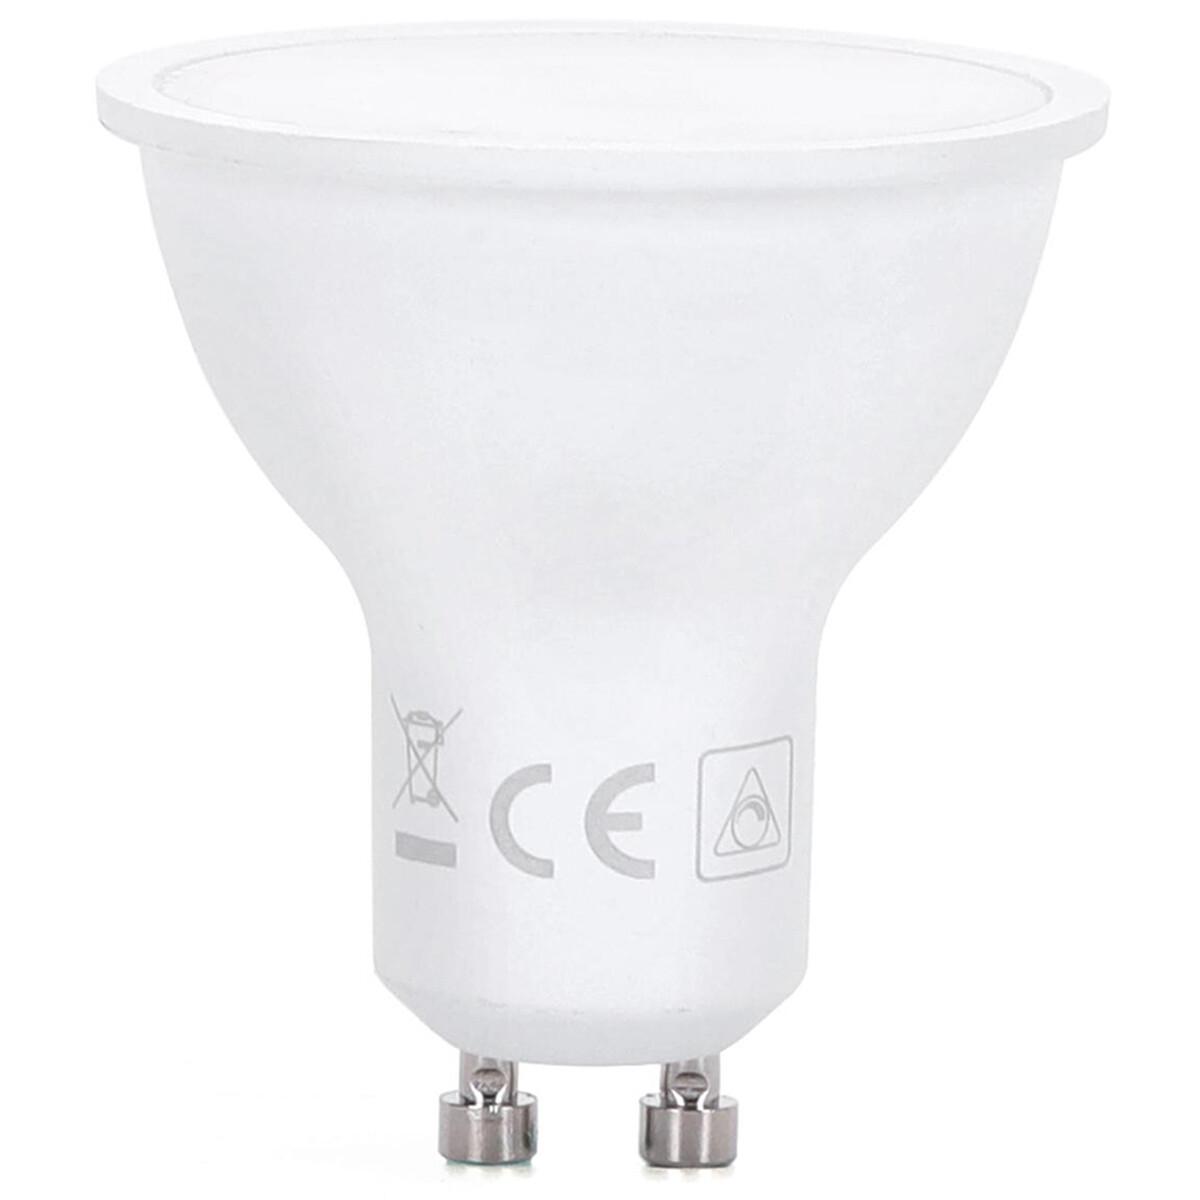 LED Spot - Aigi Wonki - GU10 Fitting - 5W - Aanpasbare Kleur CCT - Timer